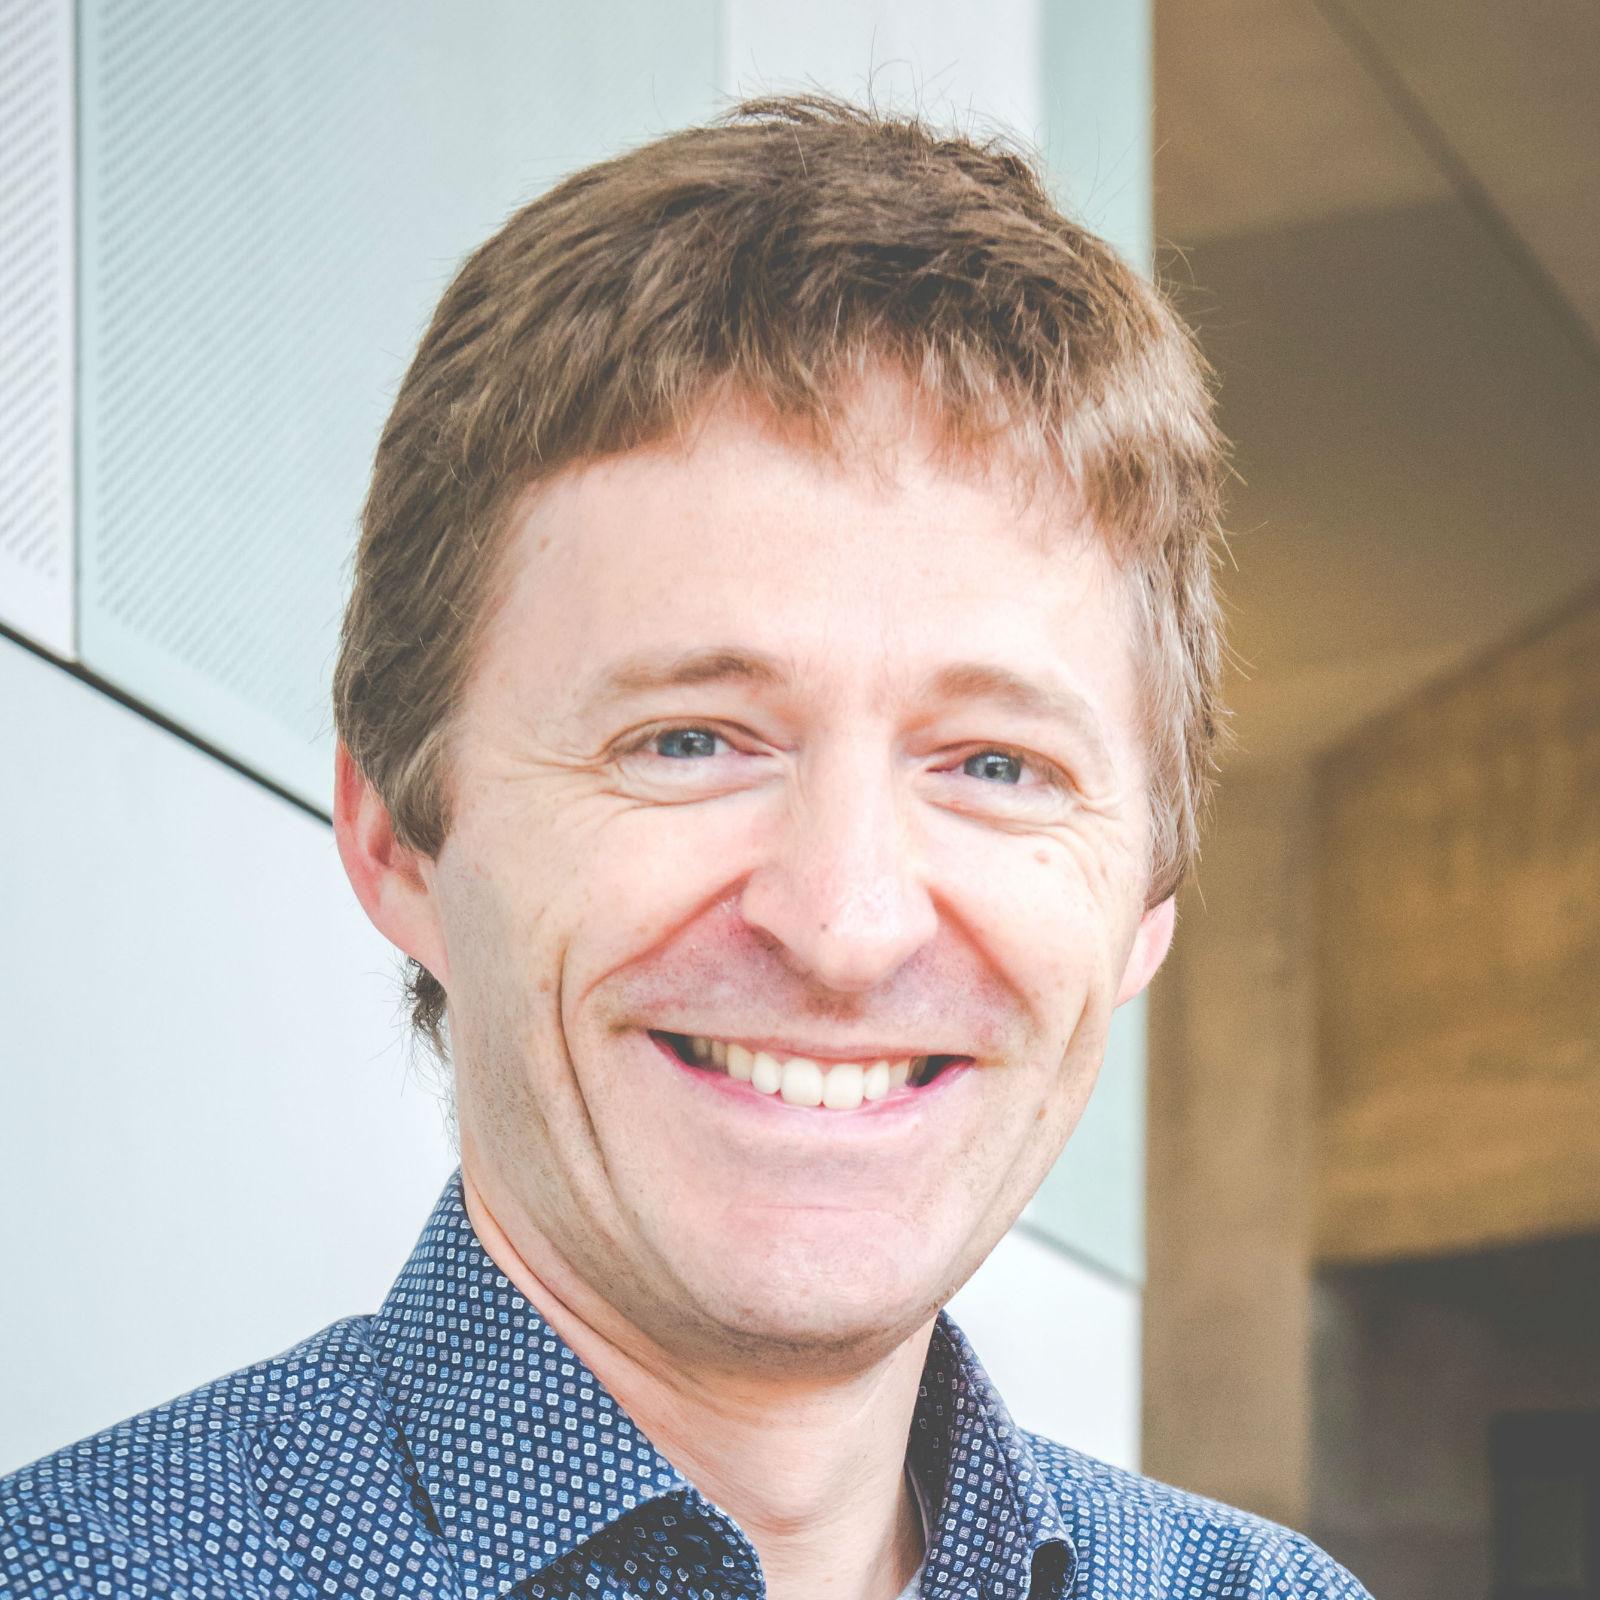 Dirk Loeckx